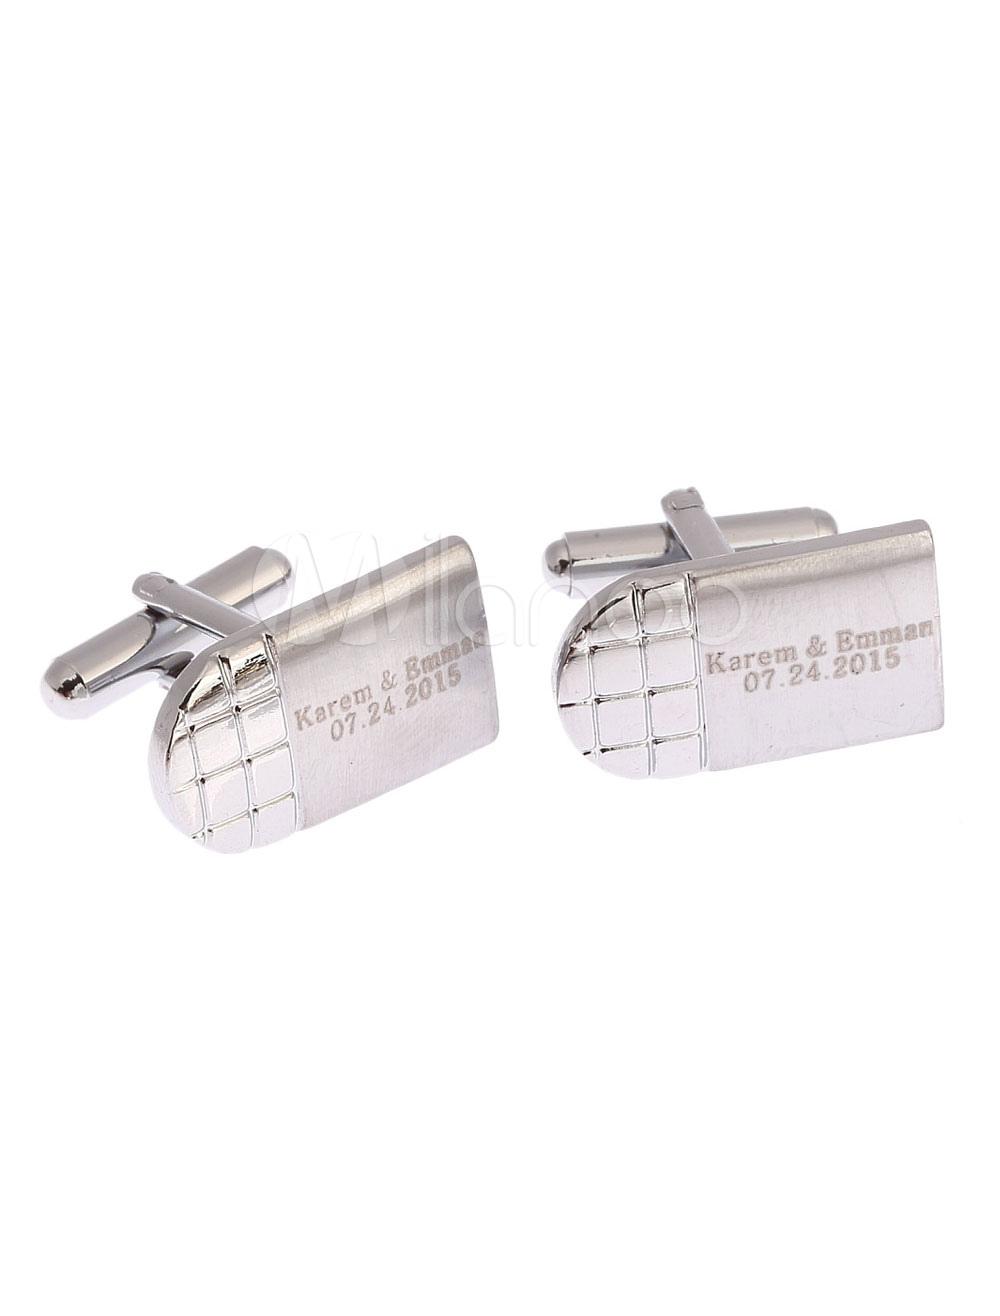 Wedding Personalised Cufflinks Men's Silver Name Date Customized Shirt Cufflinks Gift thumbnail